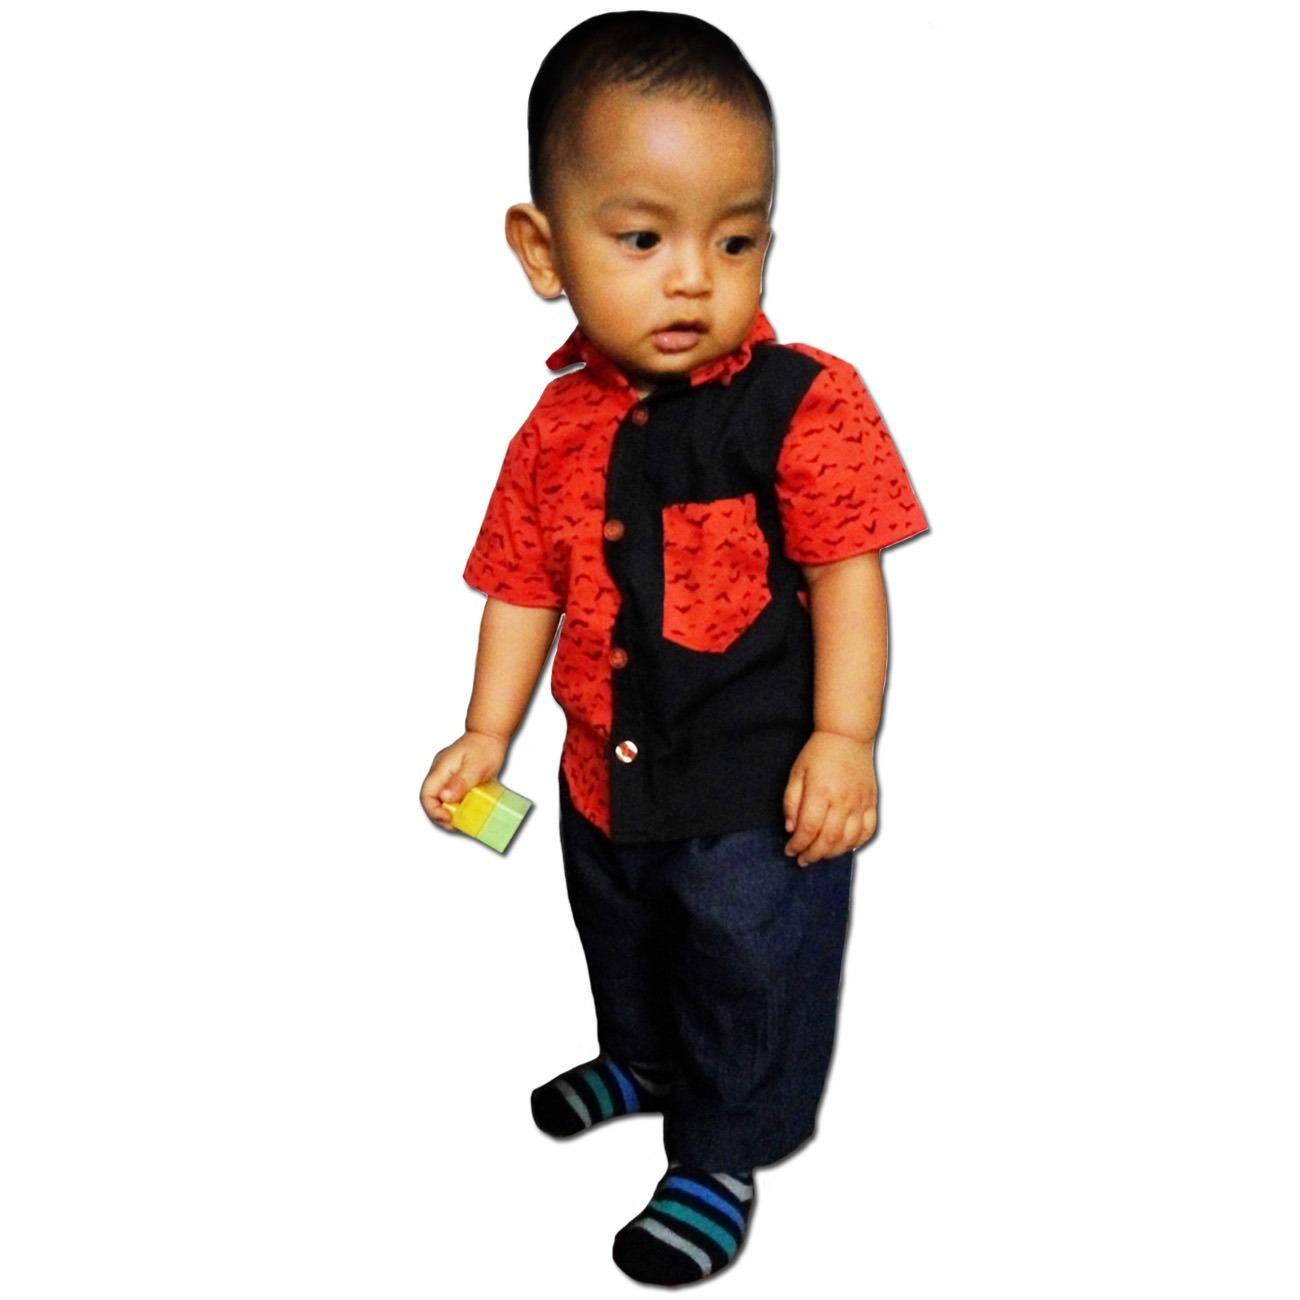 eLBi - Kemeja Anak Bayi Motif Little Bee Boutique / Baju Anak / Baju Anak Laki-laki / Baju Casual Anak Balita / Kemeja Anak Laki-laki / Kemeja Anak